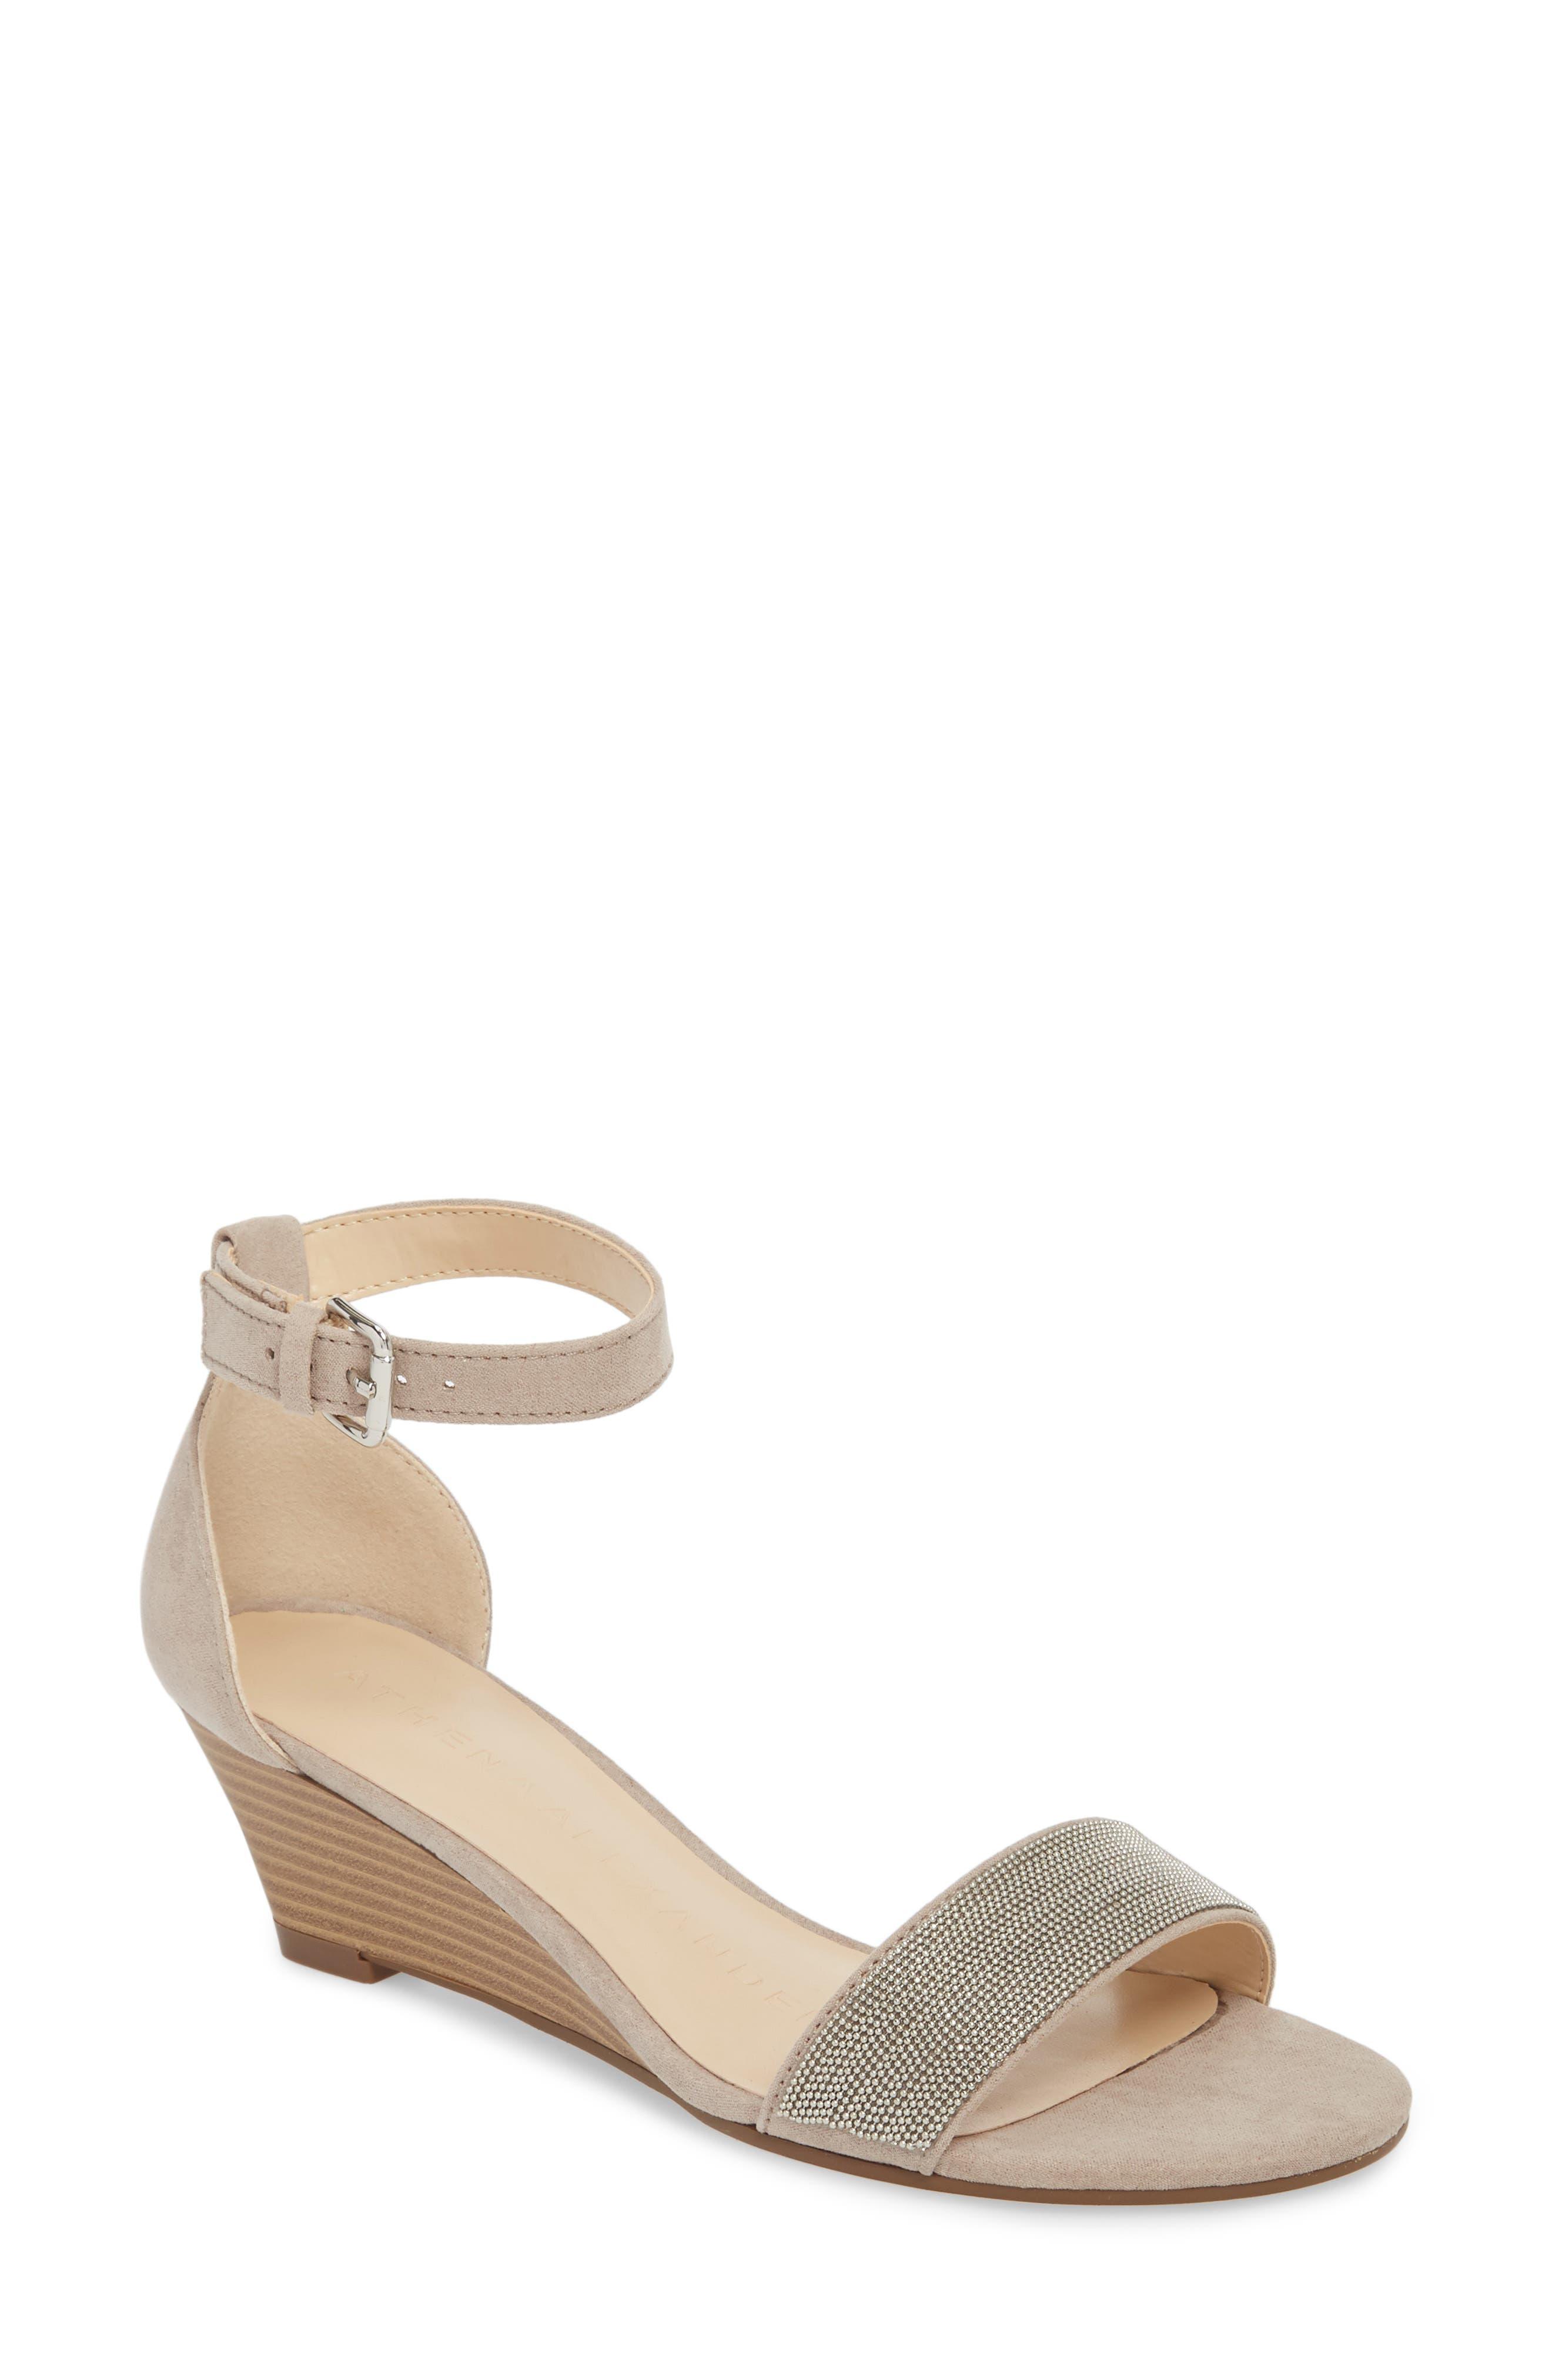 Athena Alexander Enfield Ankle Strap Wedge Sandal (Women)